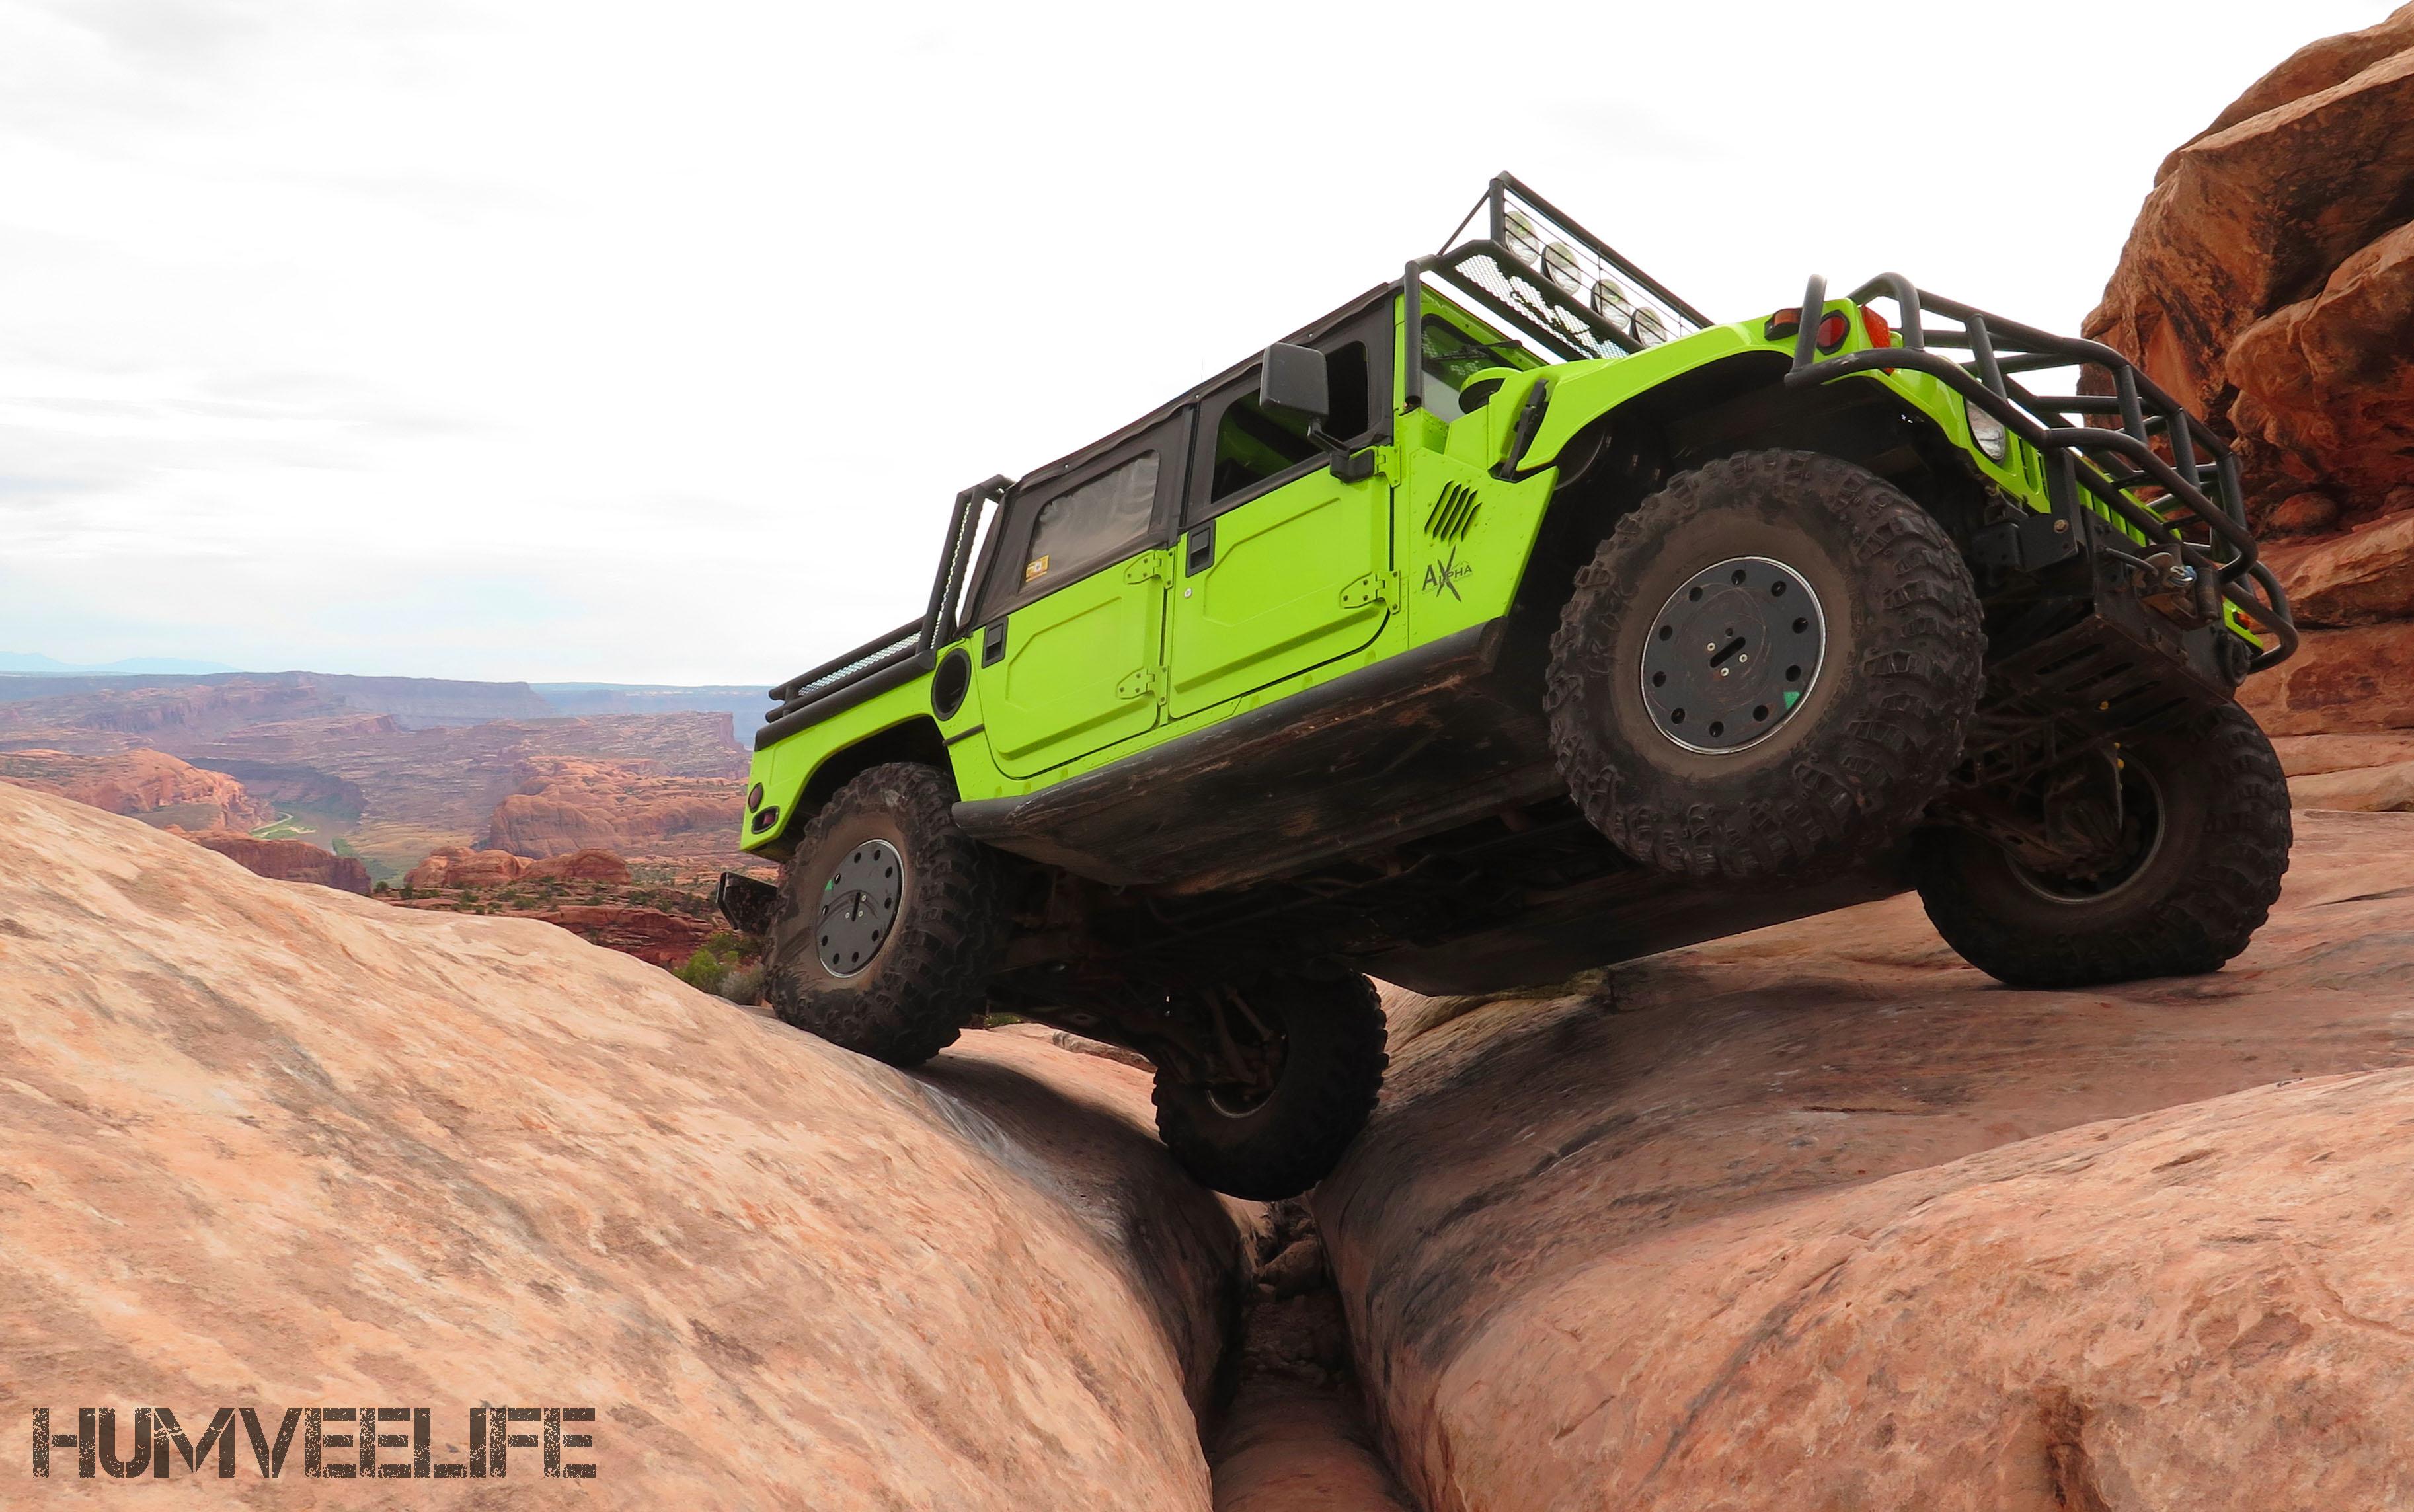 HumveeLife Moab 2015 - Pack 2 #1C